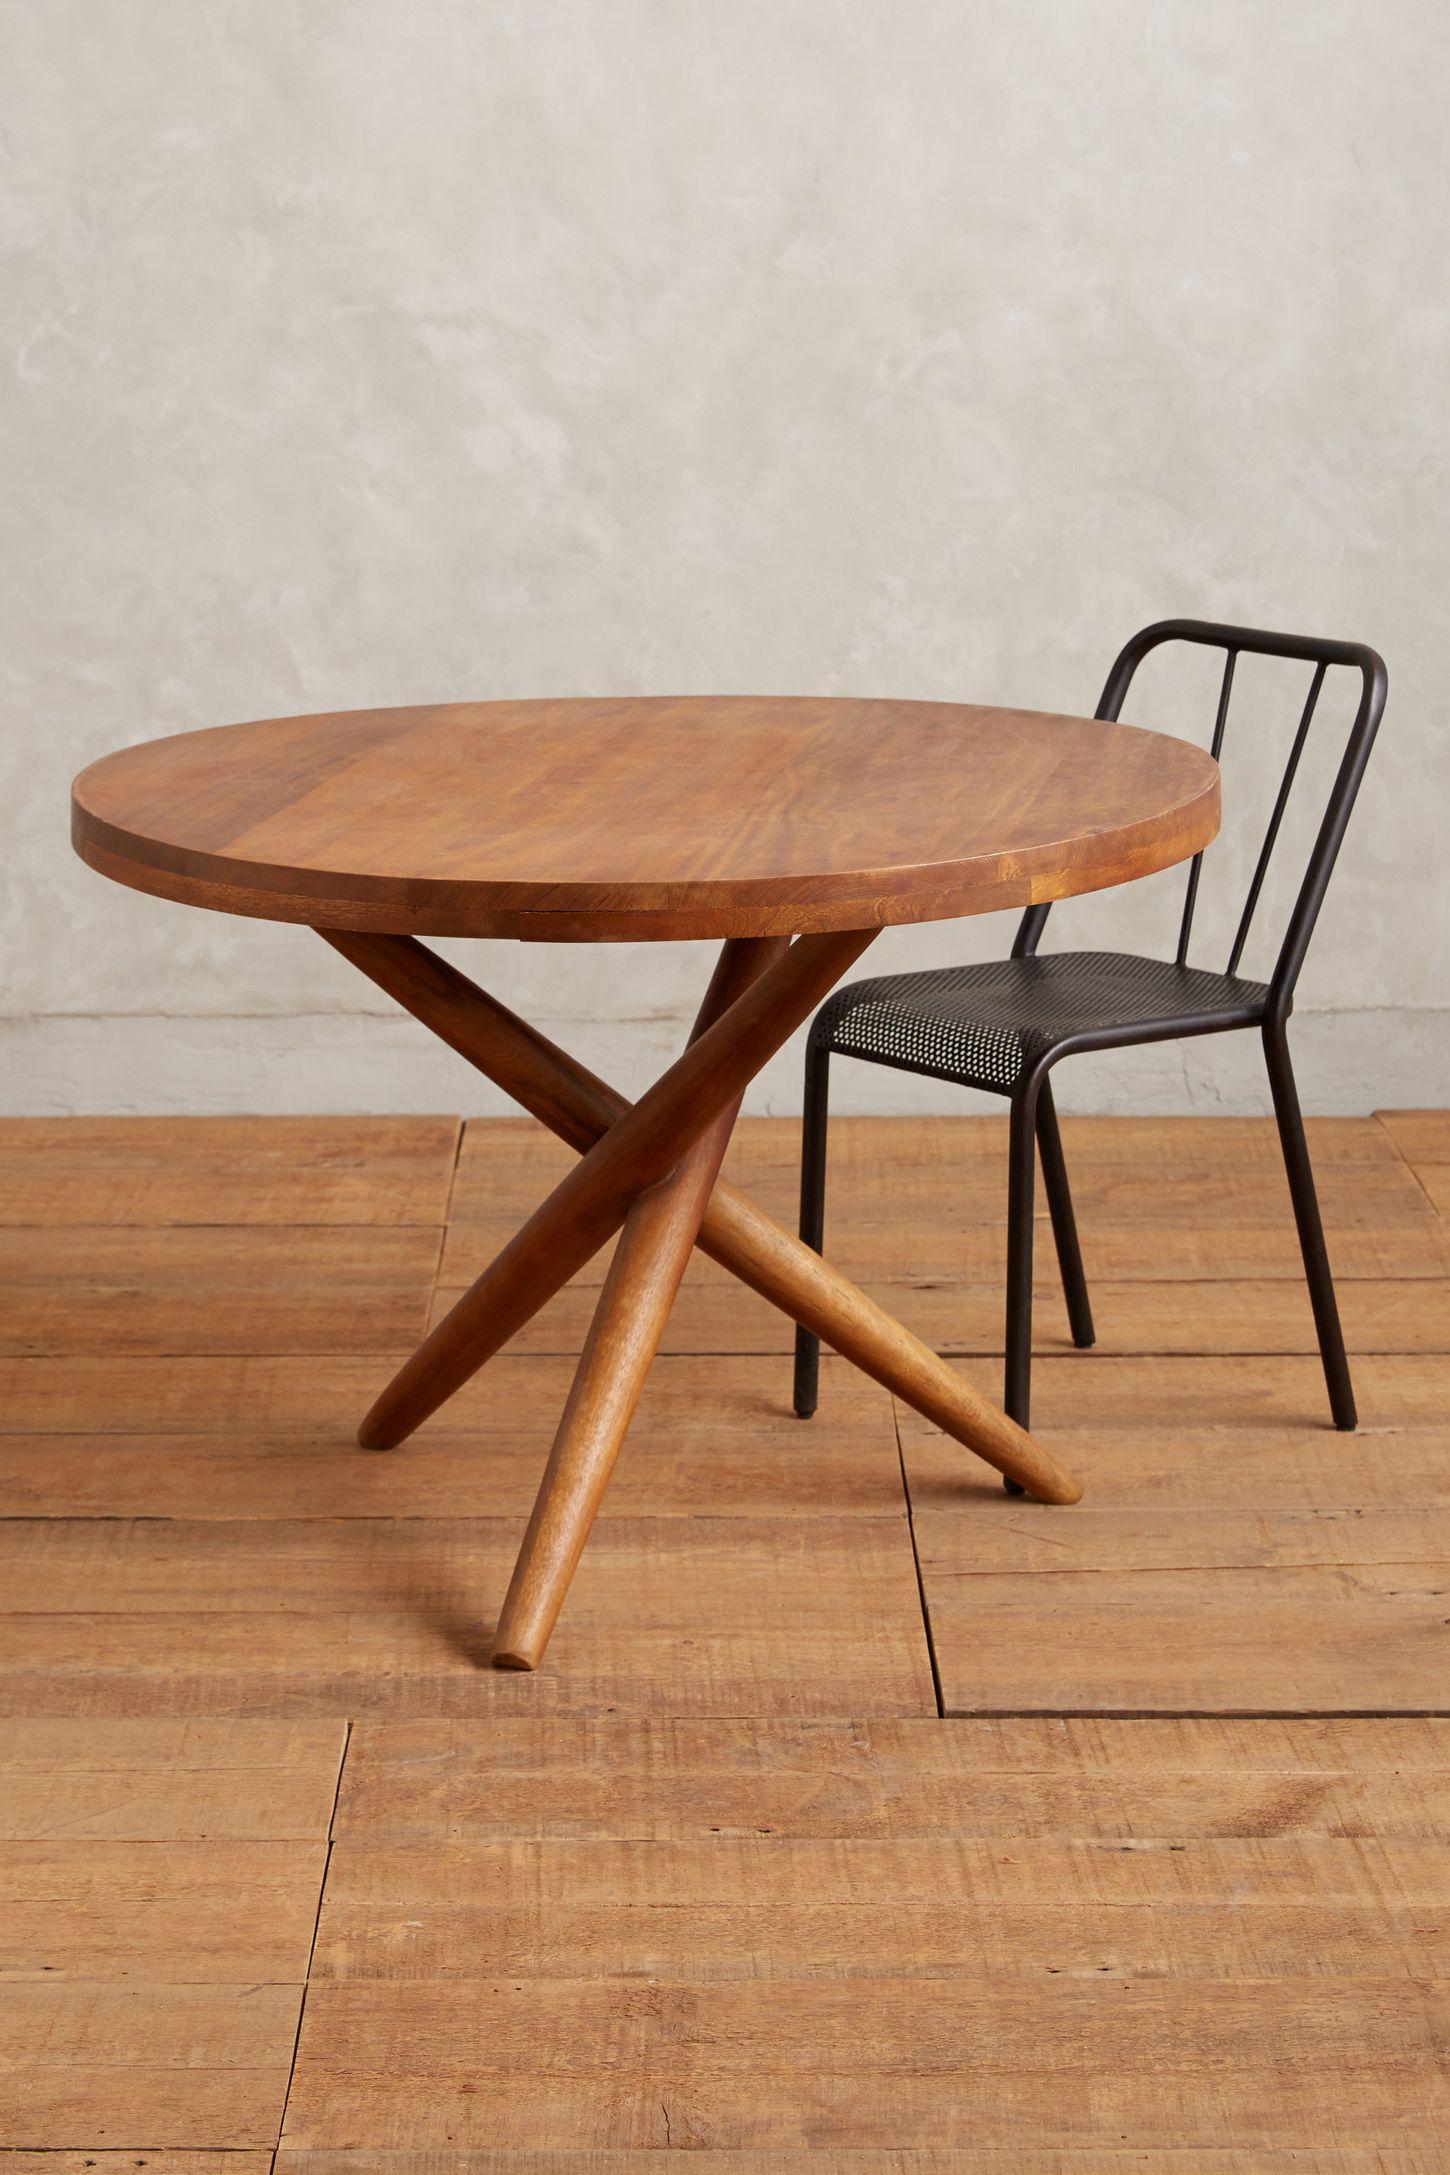 elliptic dining table anthropologie